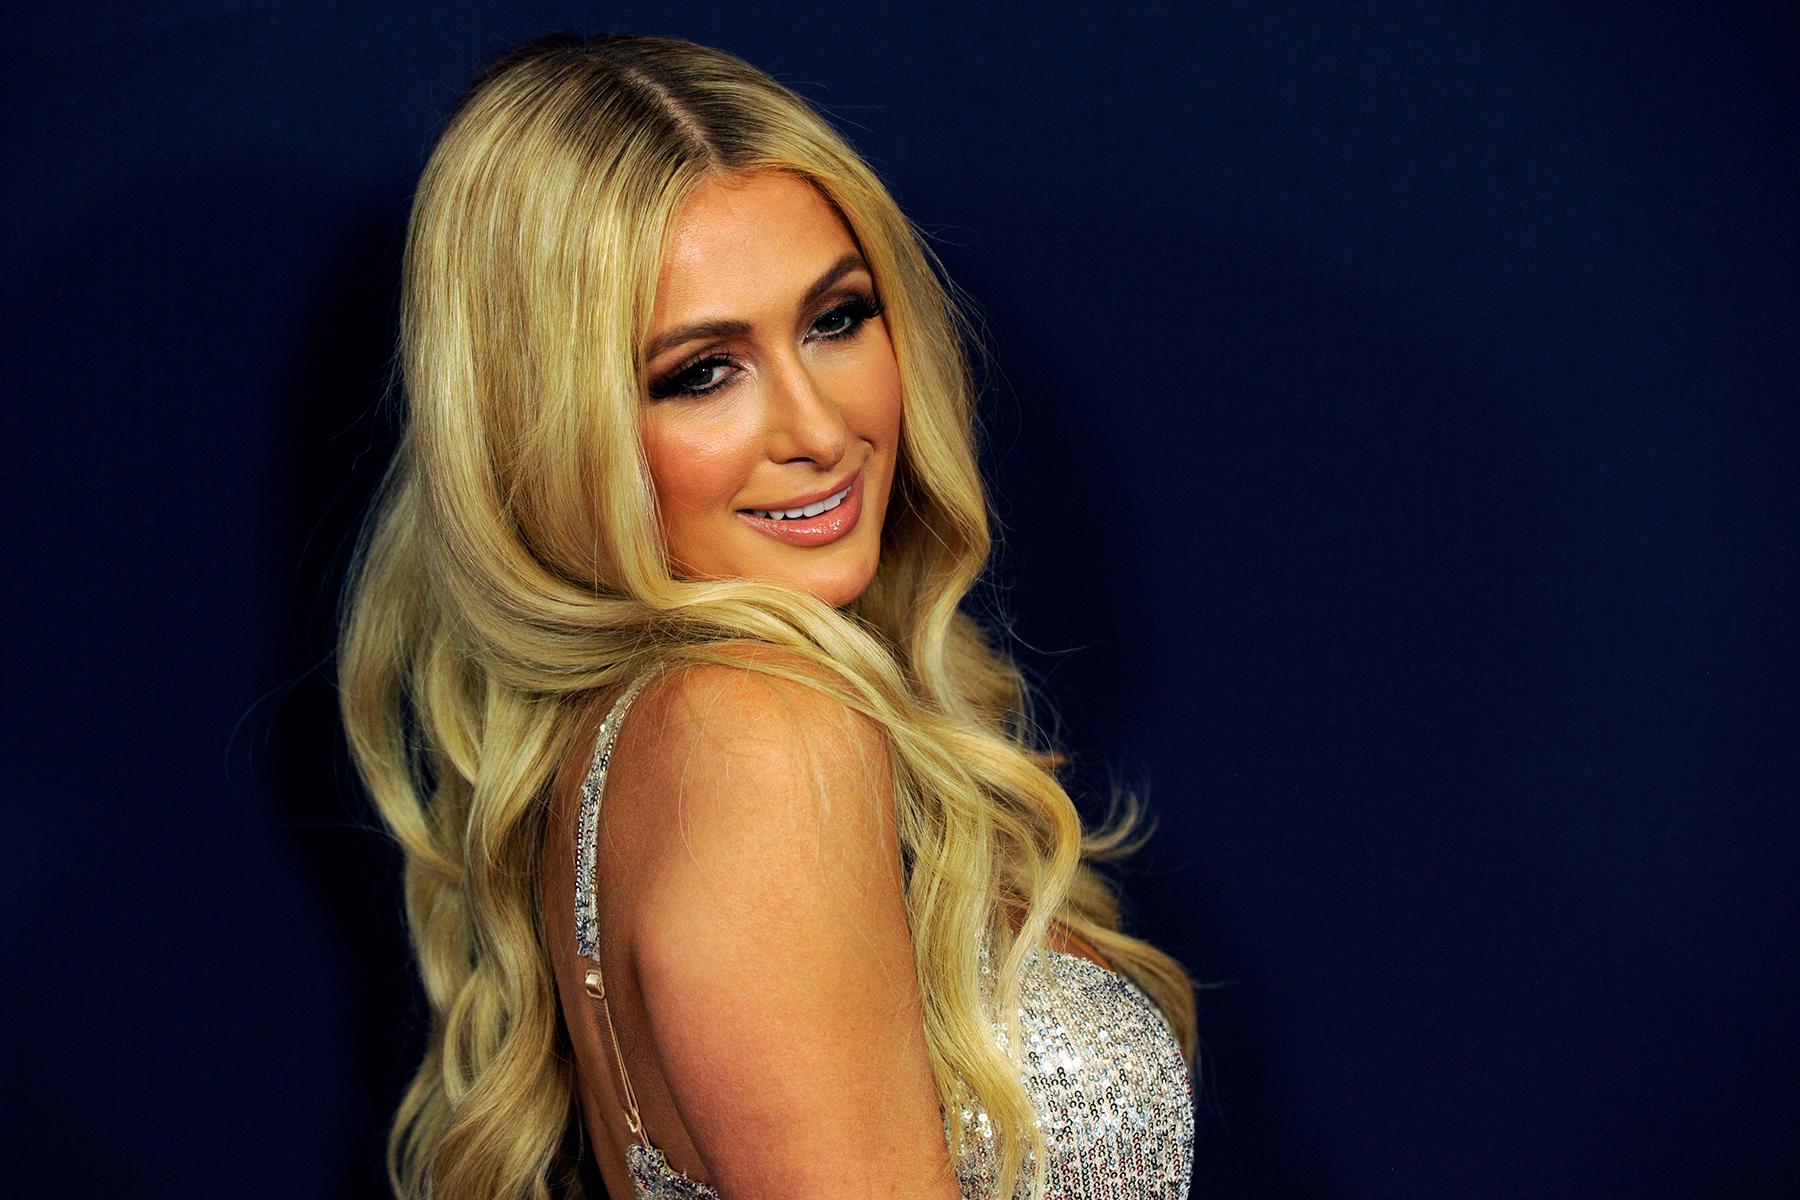 American socialite Hollywood Actress Paris Hilton posing